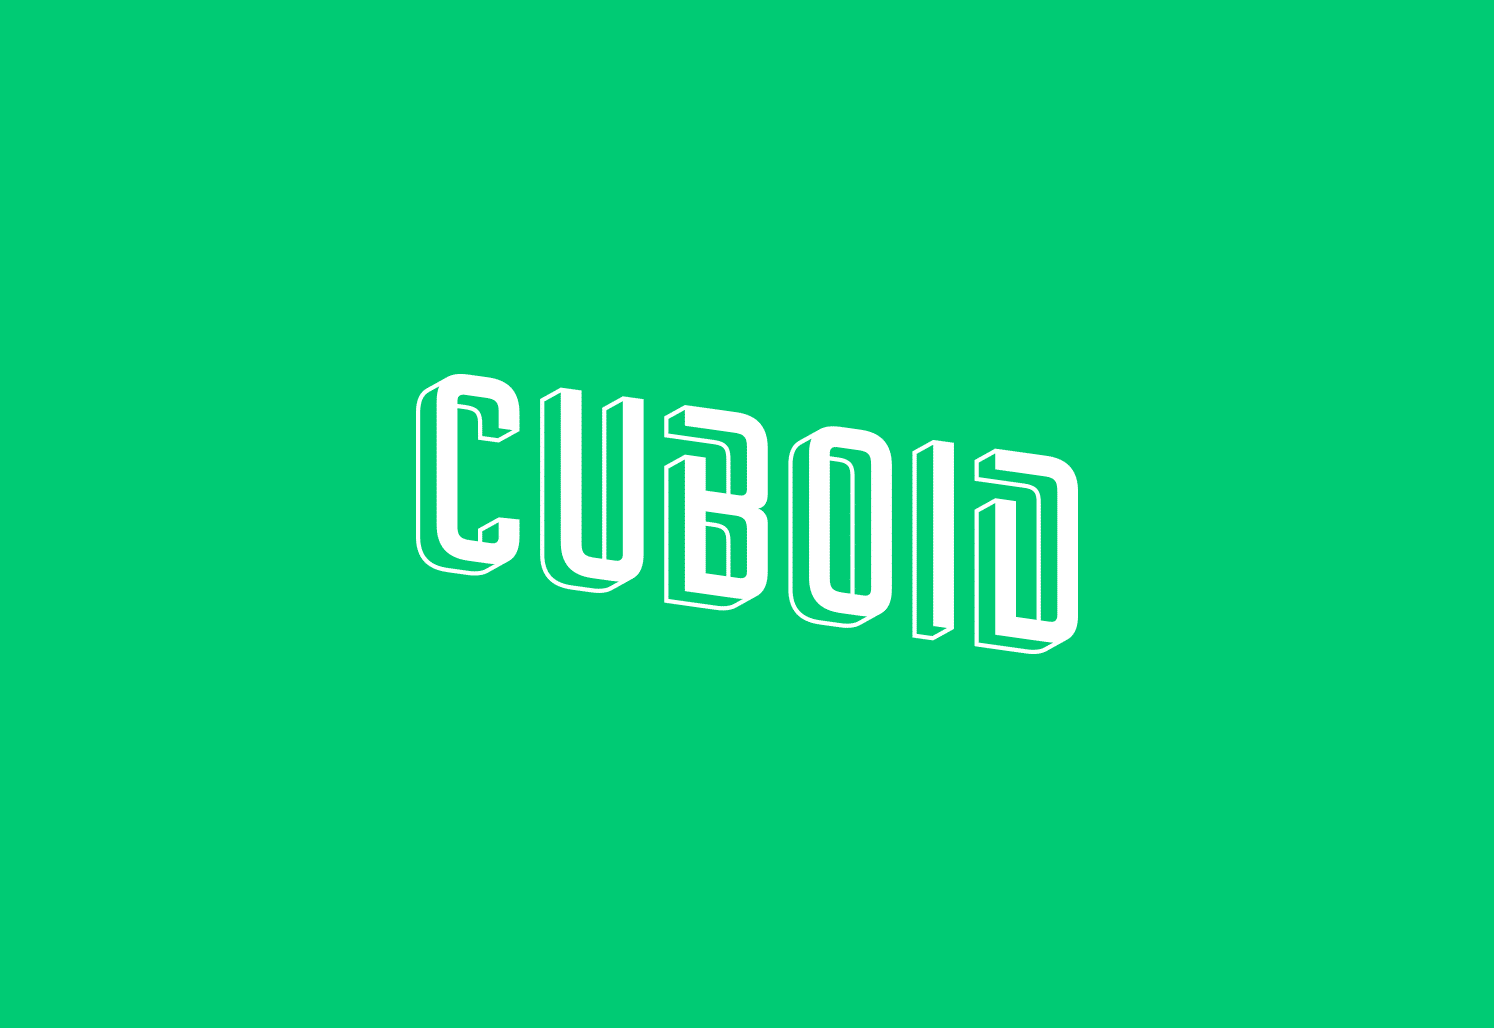 cuboid logo design adelaide main